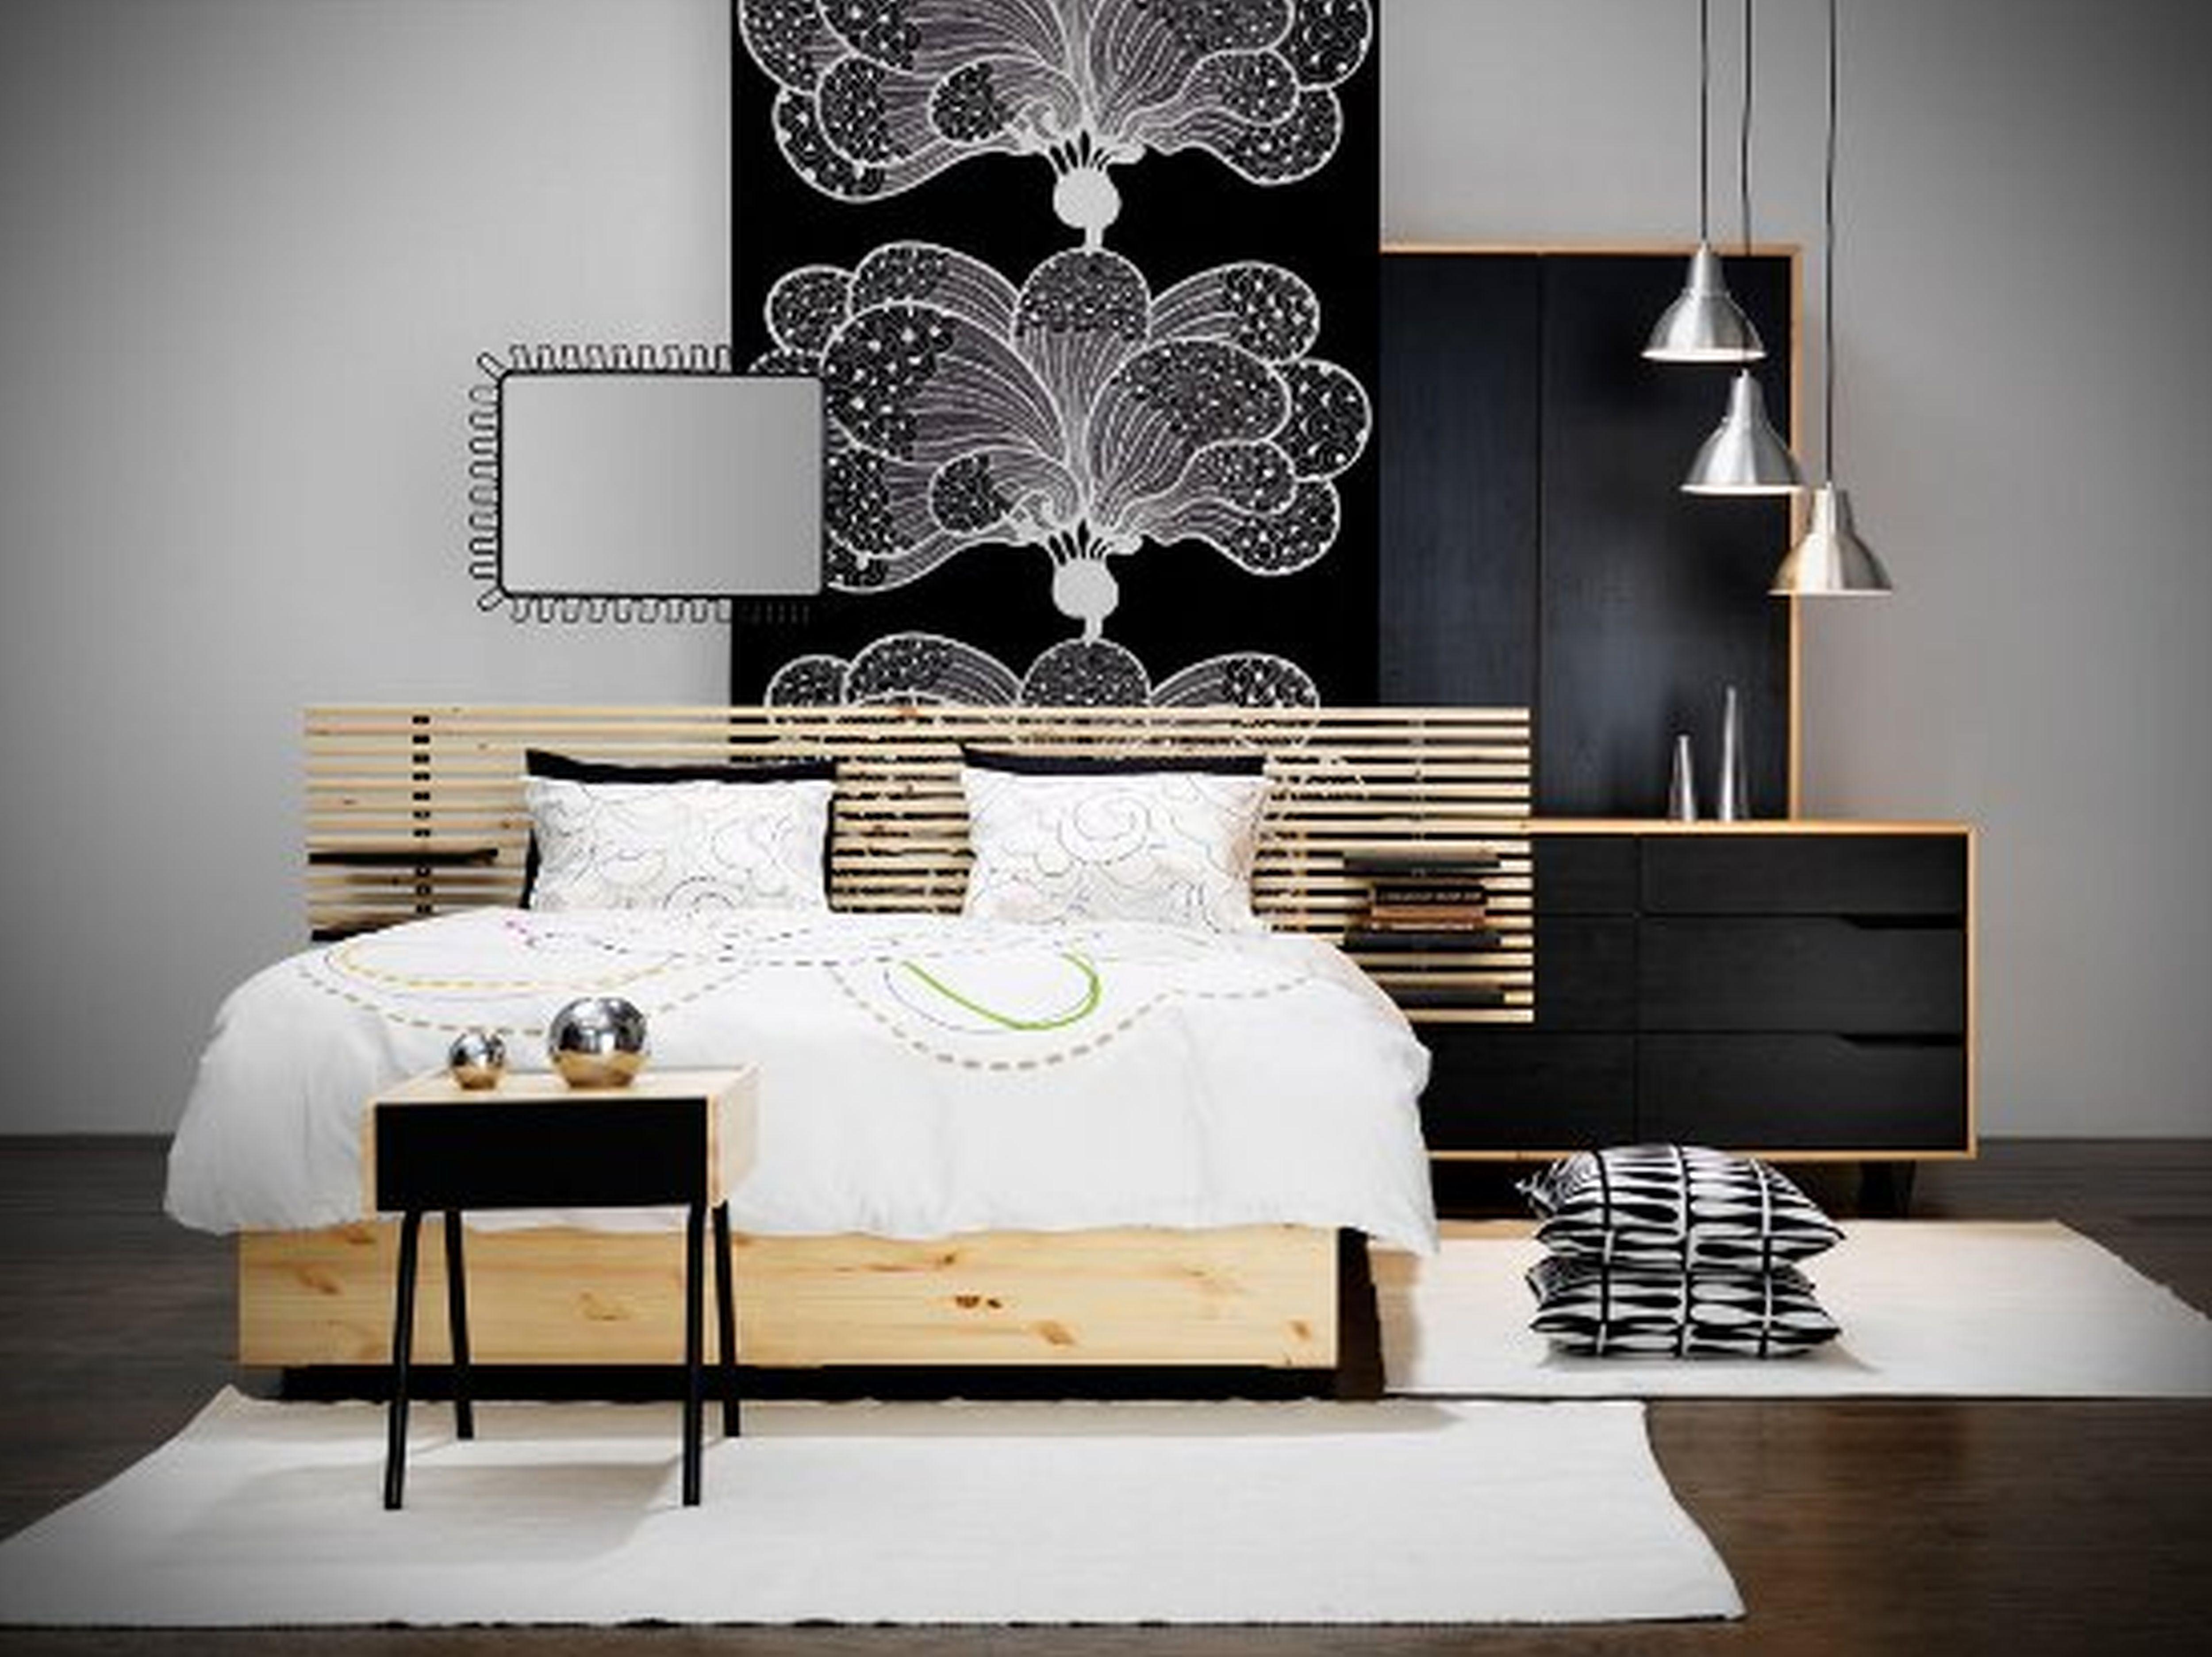 bedroom ideas with ikea furniture photo - 7